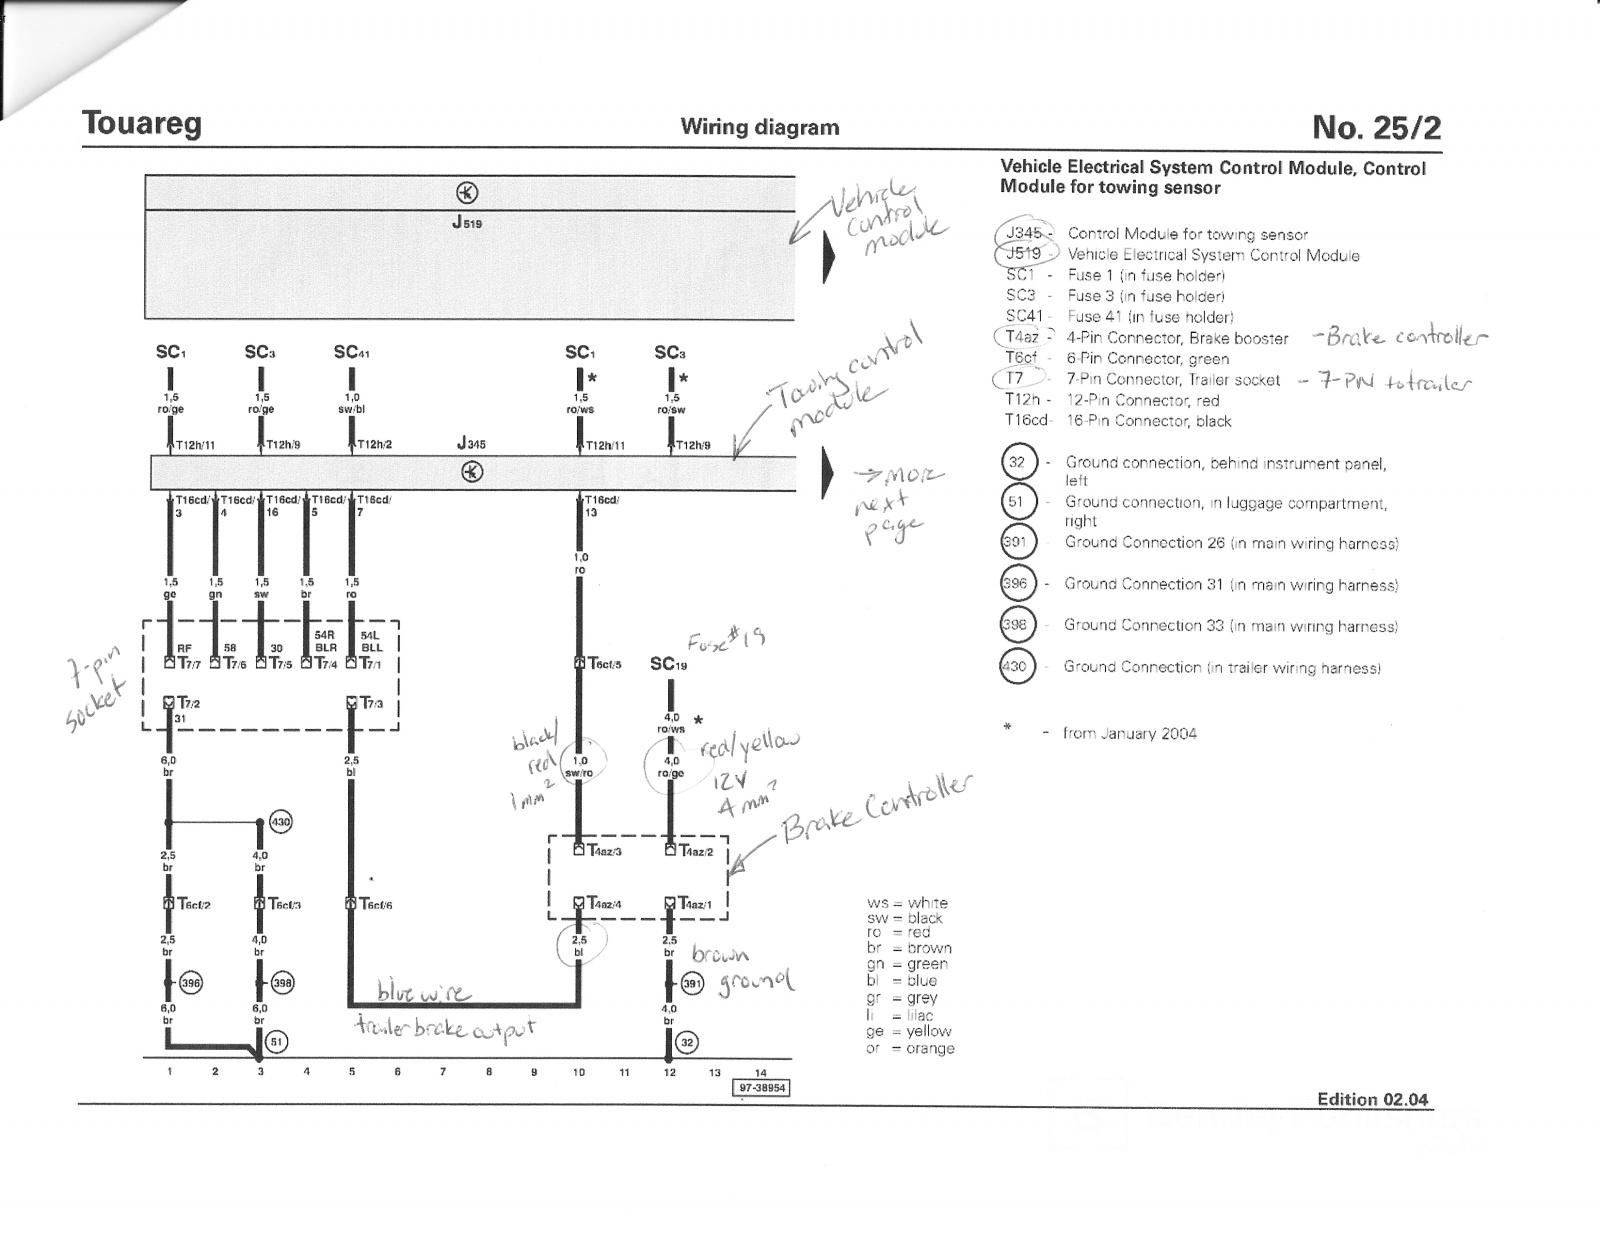 2011 Vw Touareg Engine Diagram Wiring Schematic | beam-modest wiring diagram  library | beam-modest.kivitour.itbeam-modest.kivitour.it